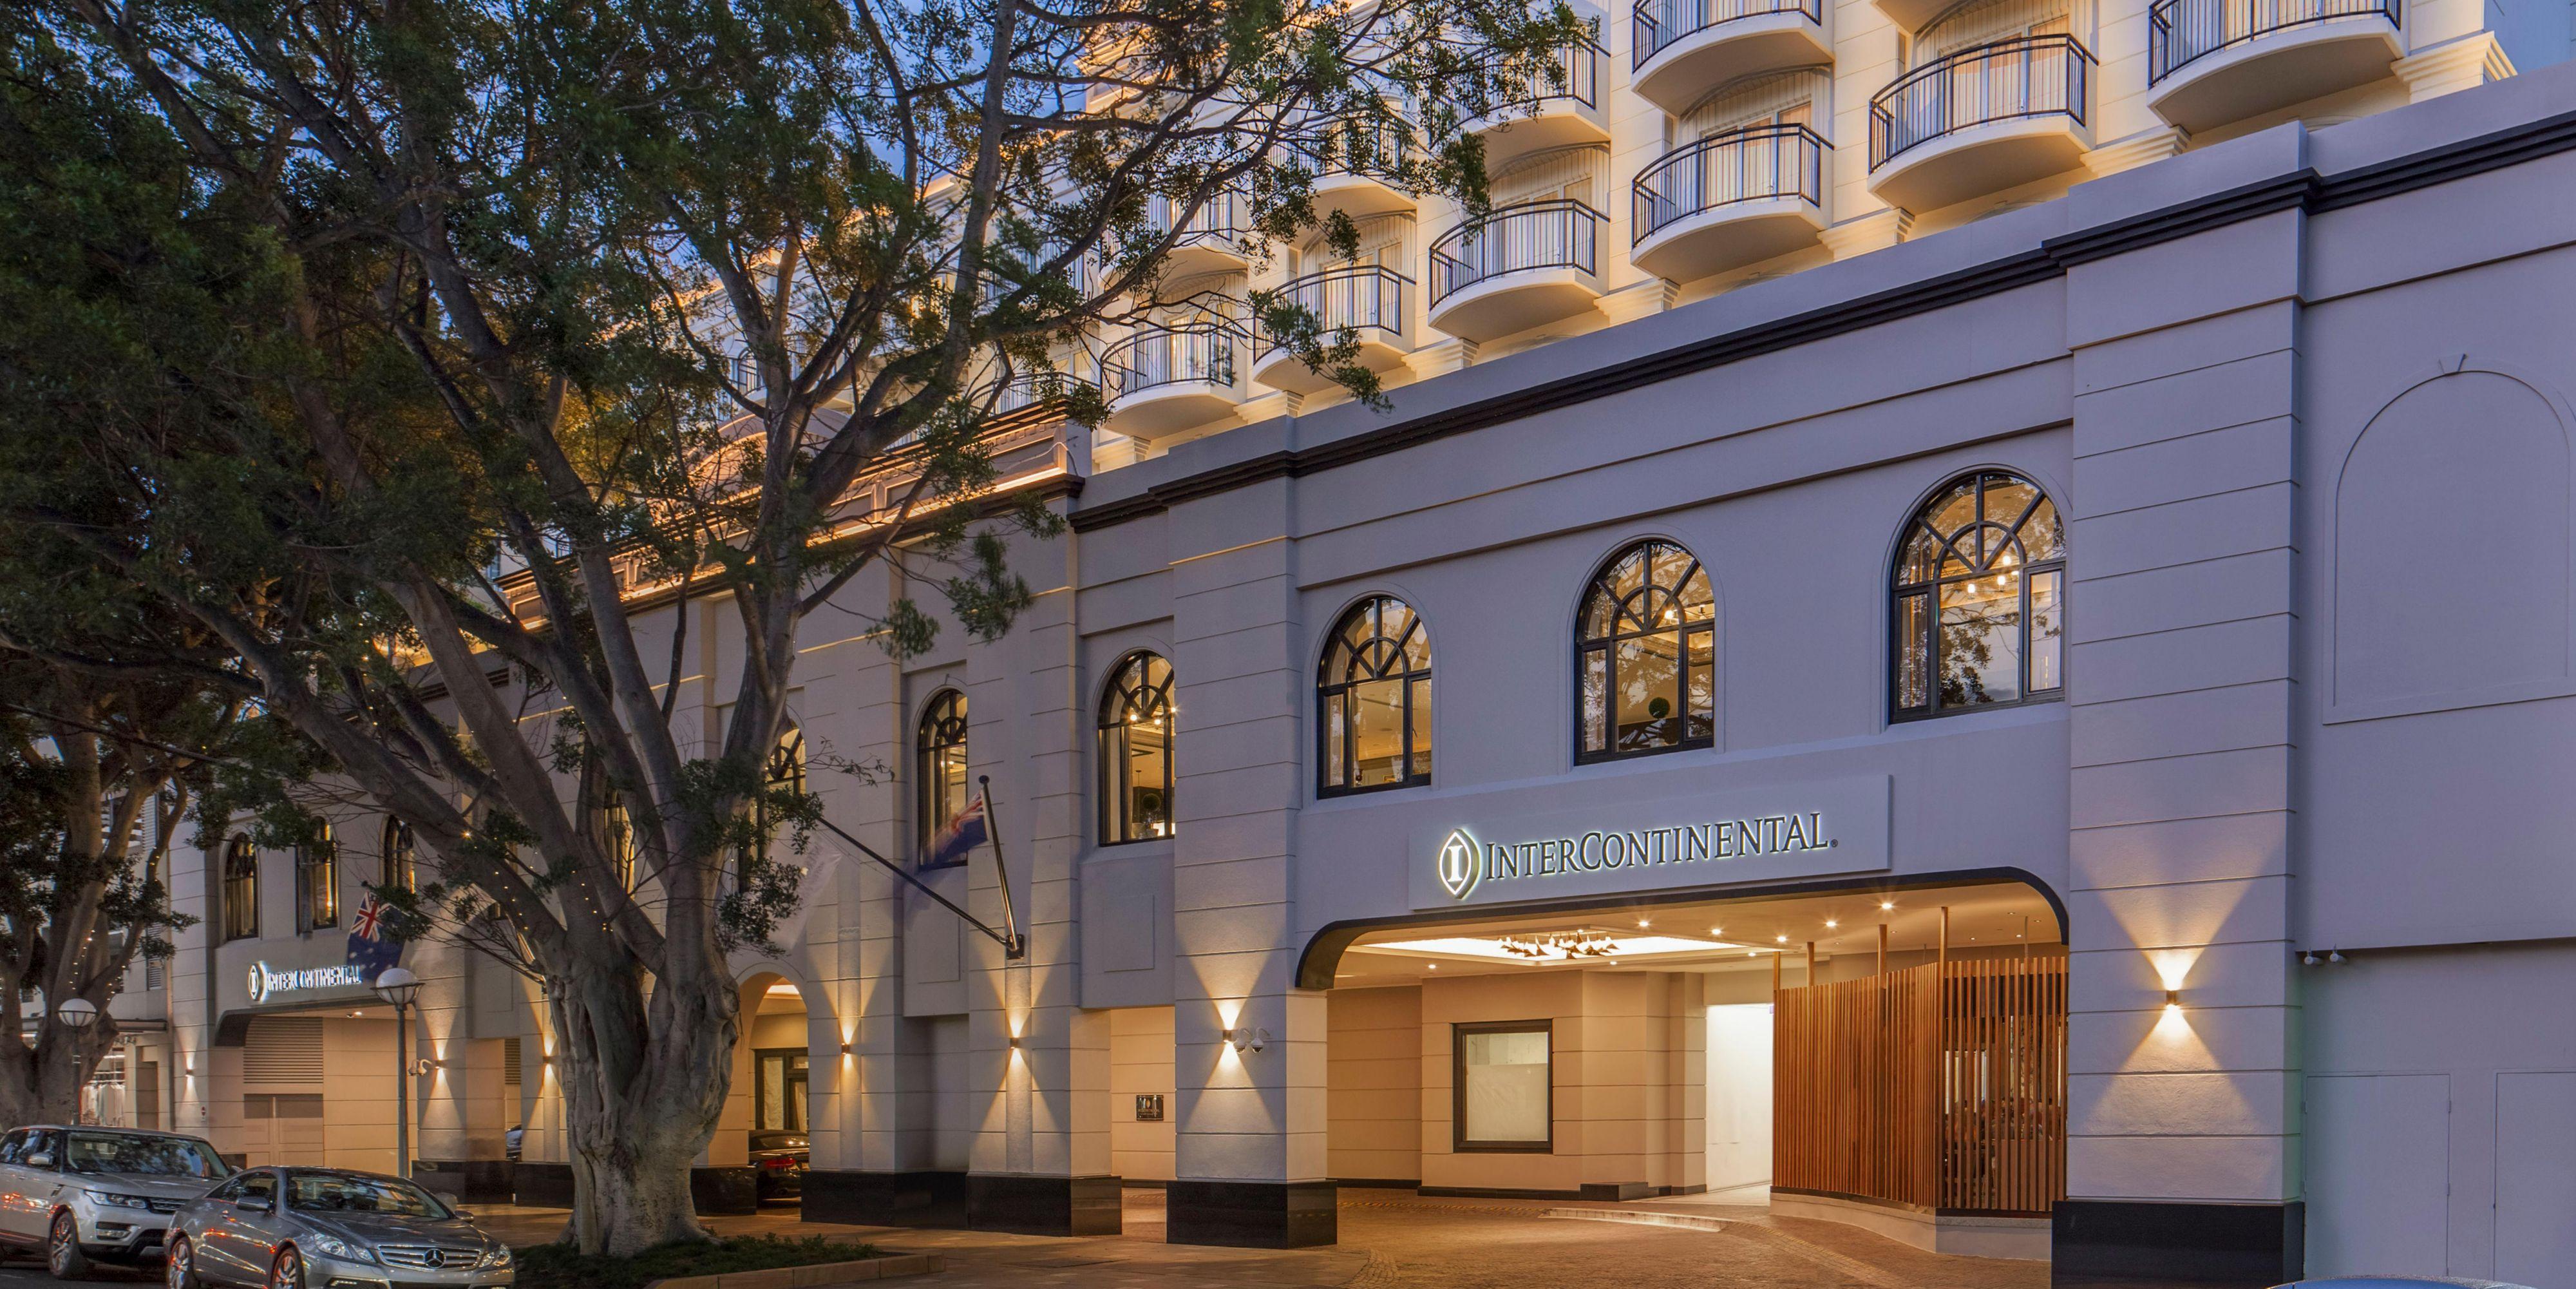 InterContinental Sydney Double Bay - 酒店评论及照片